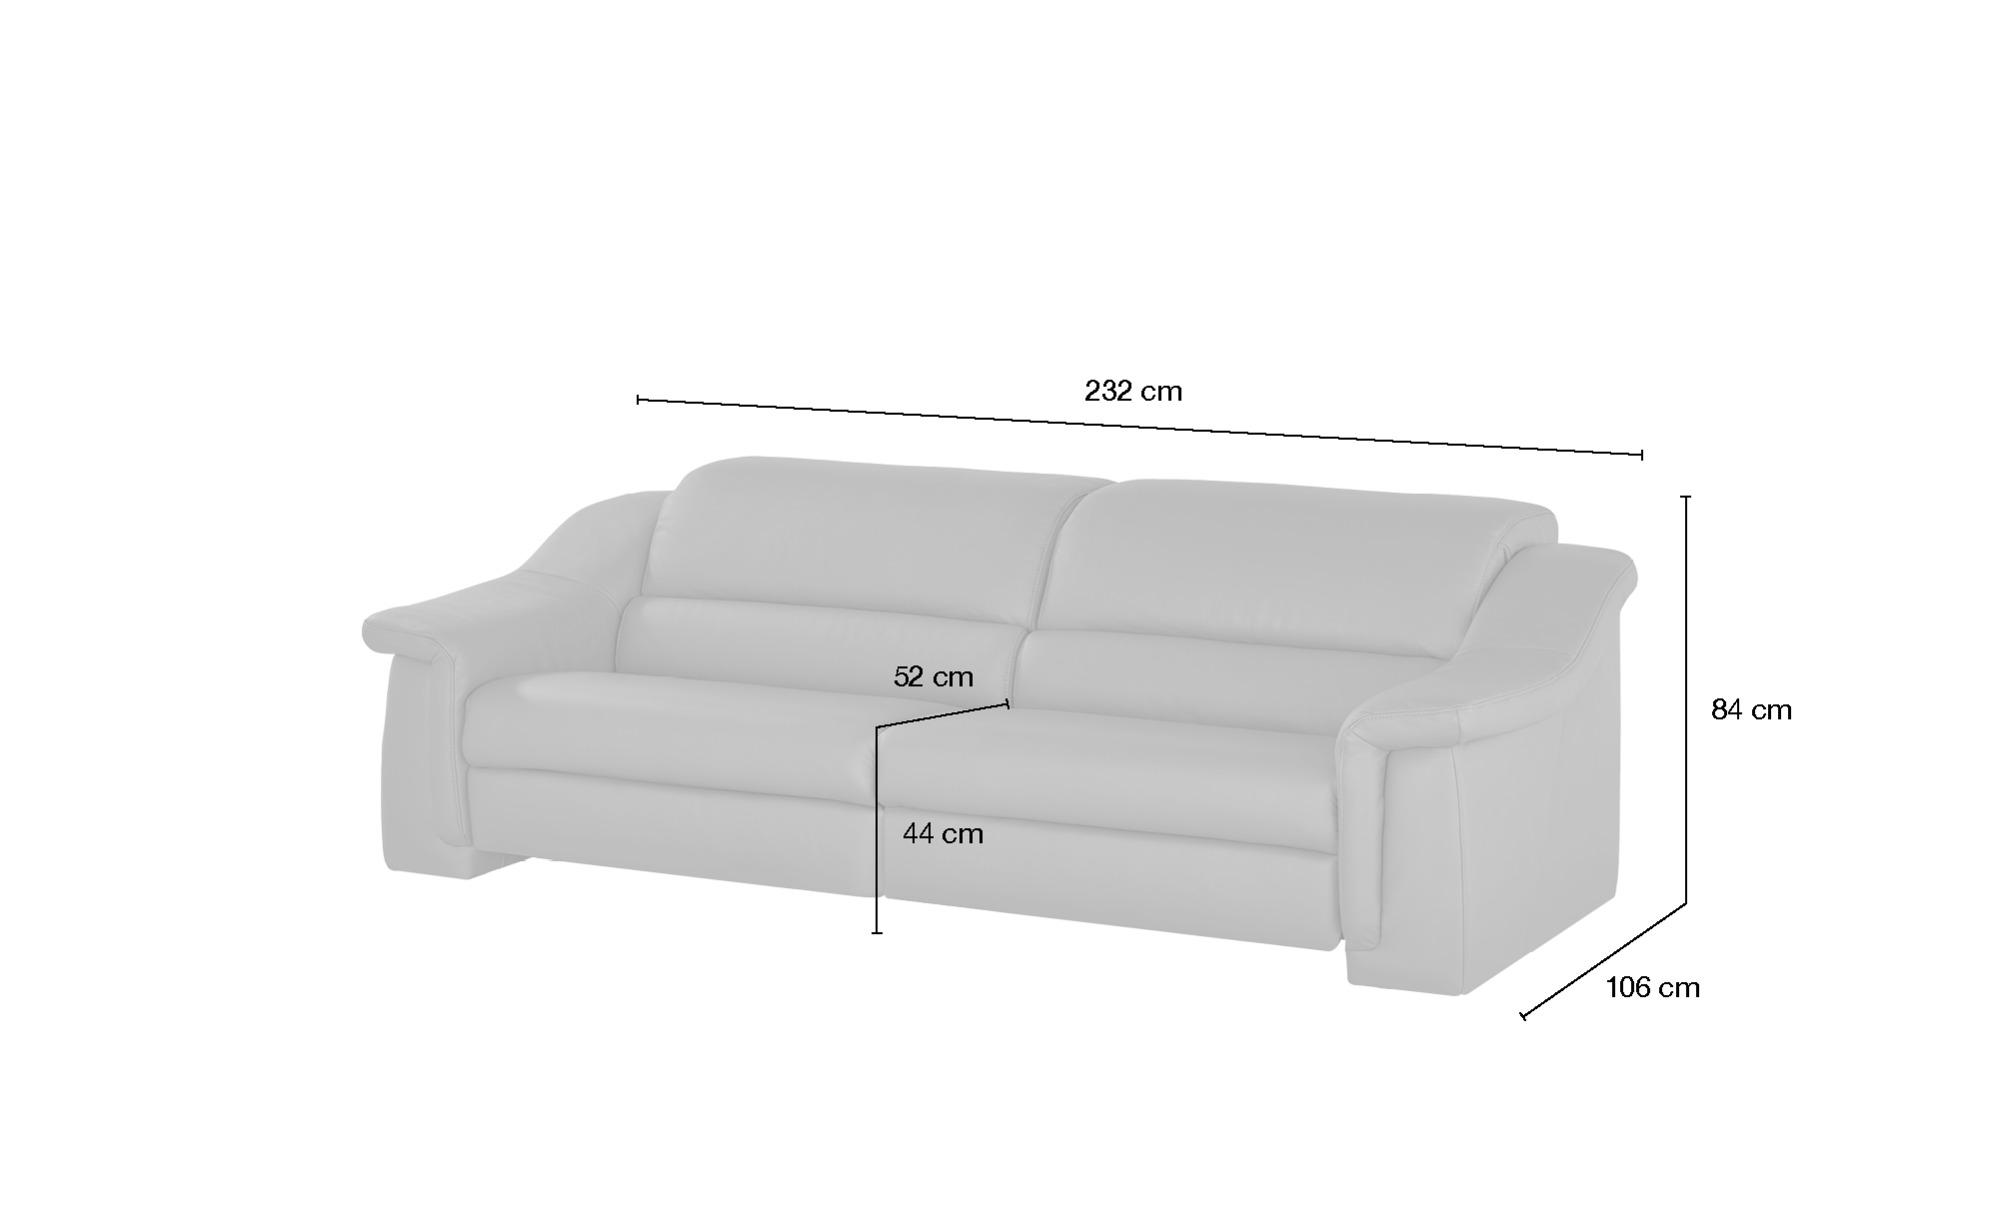 himolla Ledersofa  1501 ¦ beige ¦ Maße (cm): B: 232 H: 84 T: 106 Polstermöbel > Sofas > 3-Sitzer - Höffner